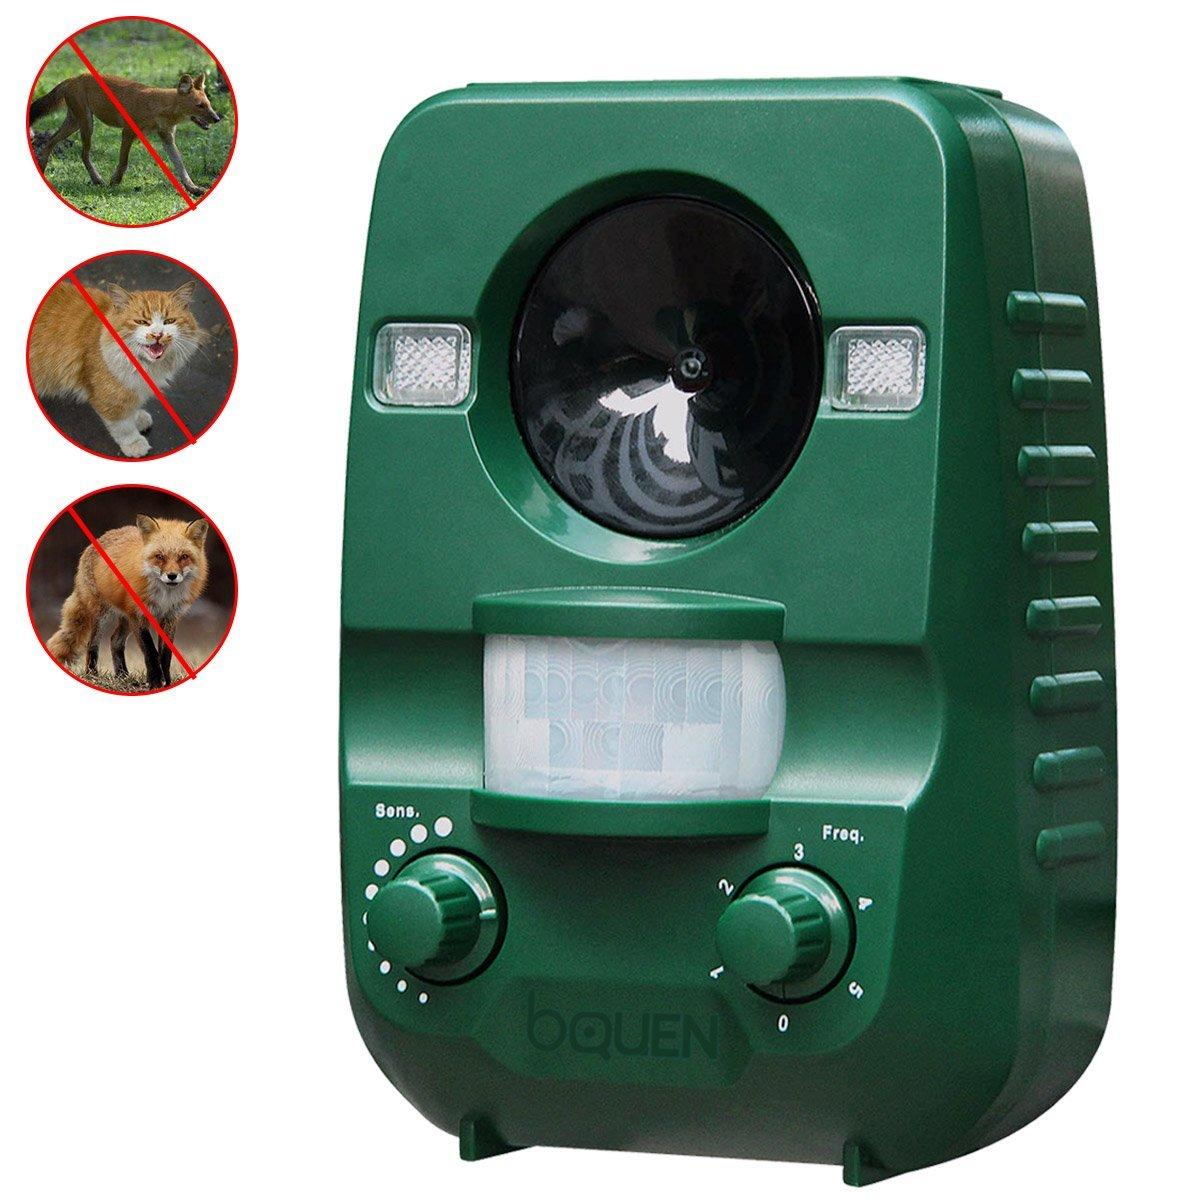 Ultrasonic Animal Cat Repeller, Solar Powered Rechargeabl...